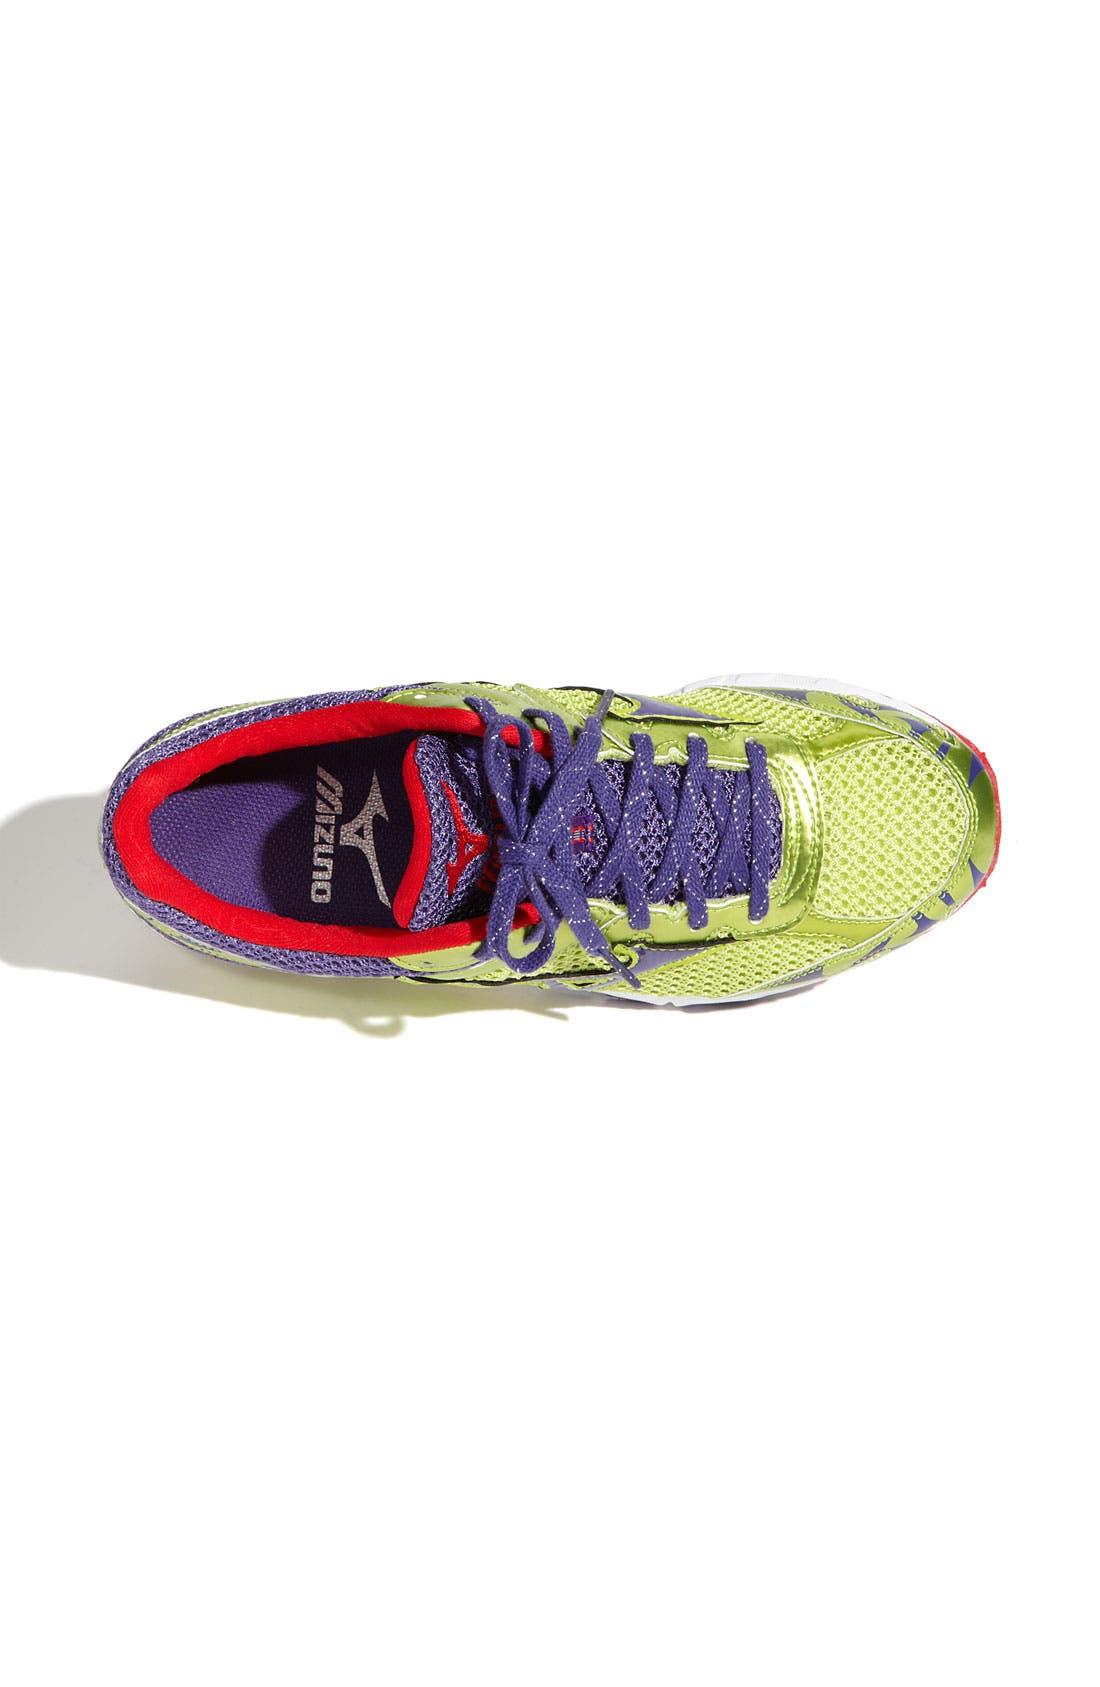 Alternate Image 3  - Mizuno 'Wave Musha 4' Running Shoe (Women) (Regular Retail Price: $89.95)